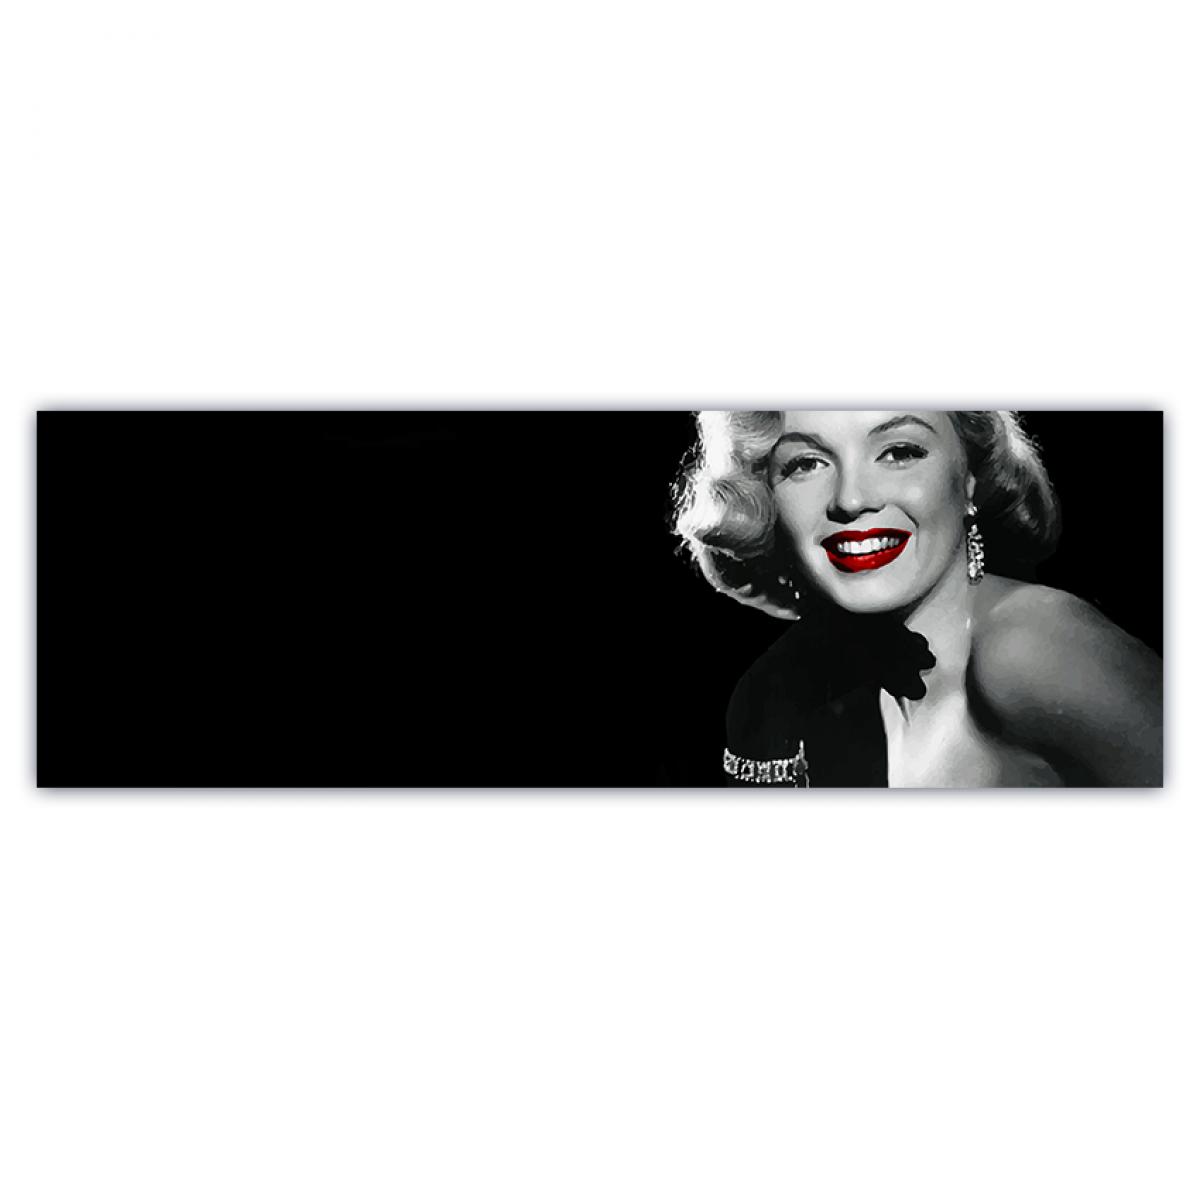 Emejing Quadri Marilyn Monroe Images - Brentwoodseasidecabins.com ...